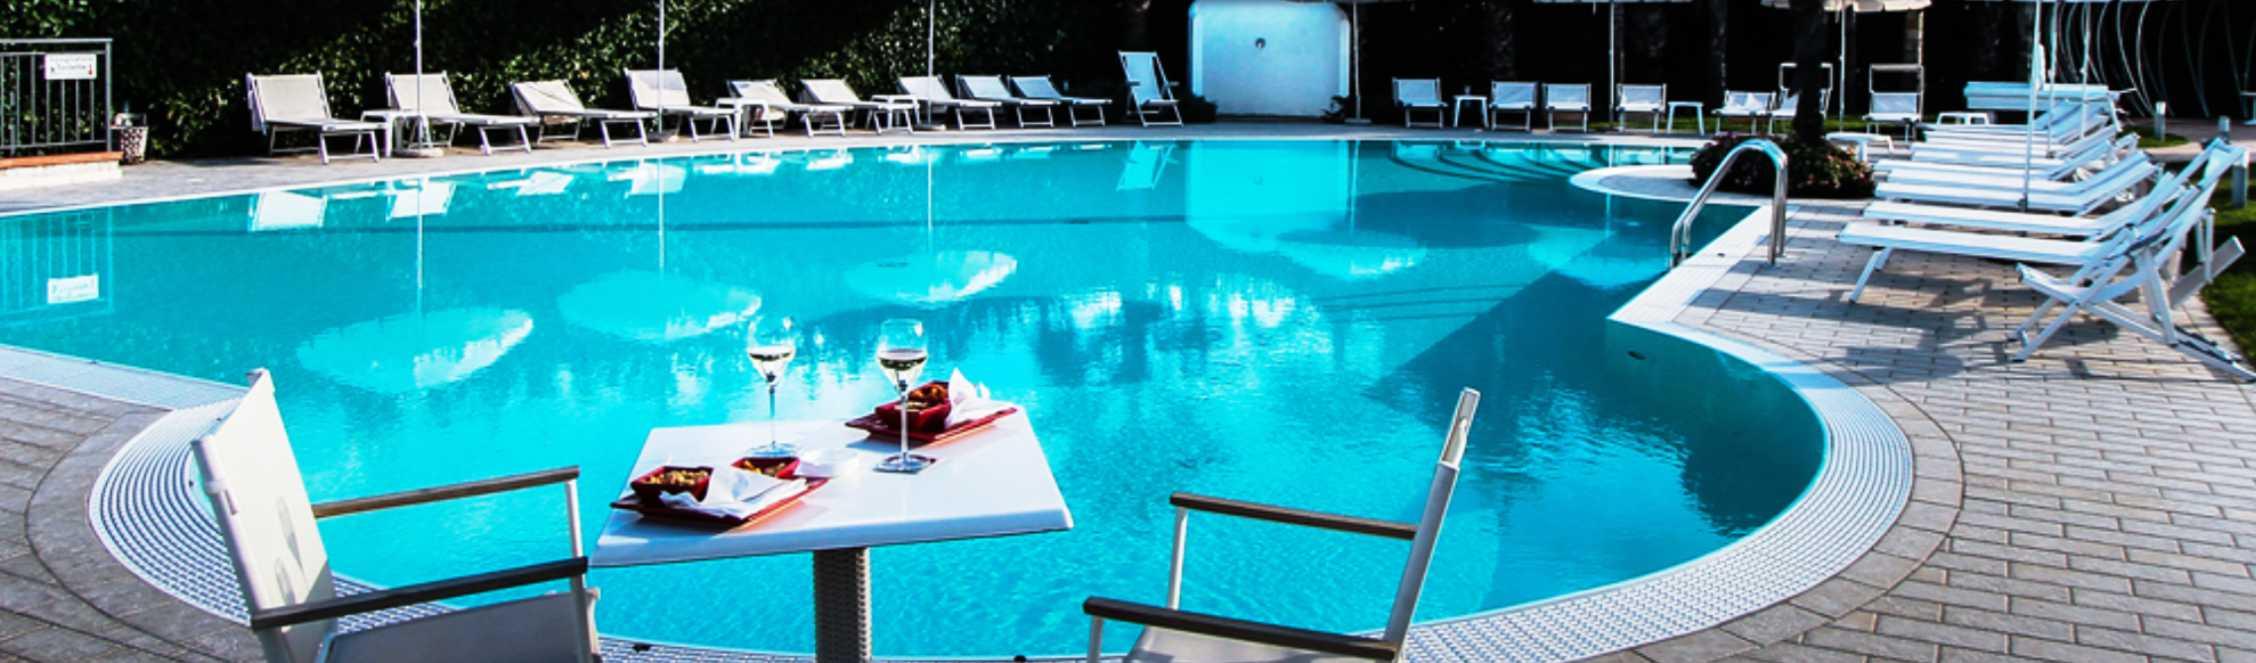 San Severino Park Hotel Piscina